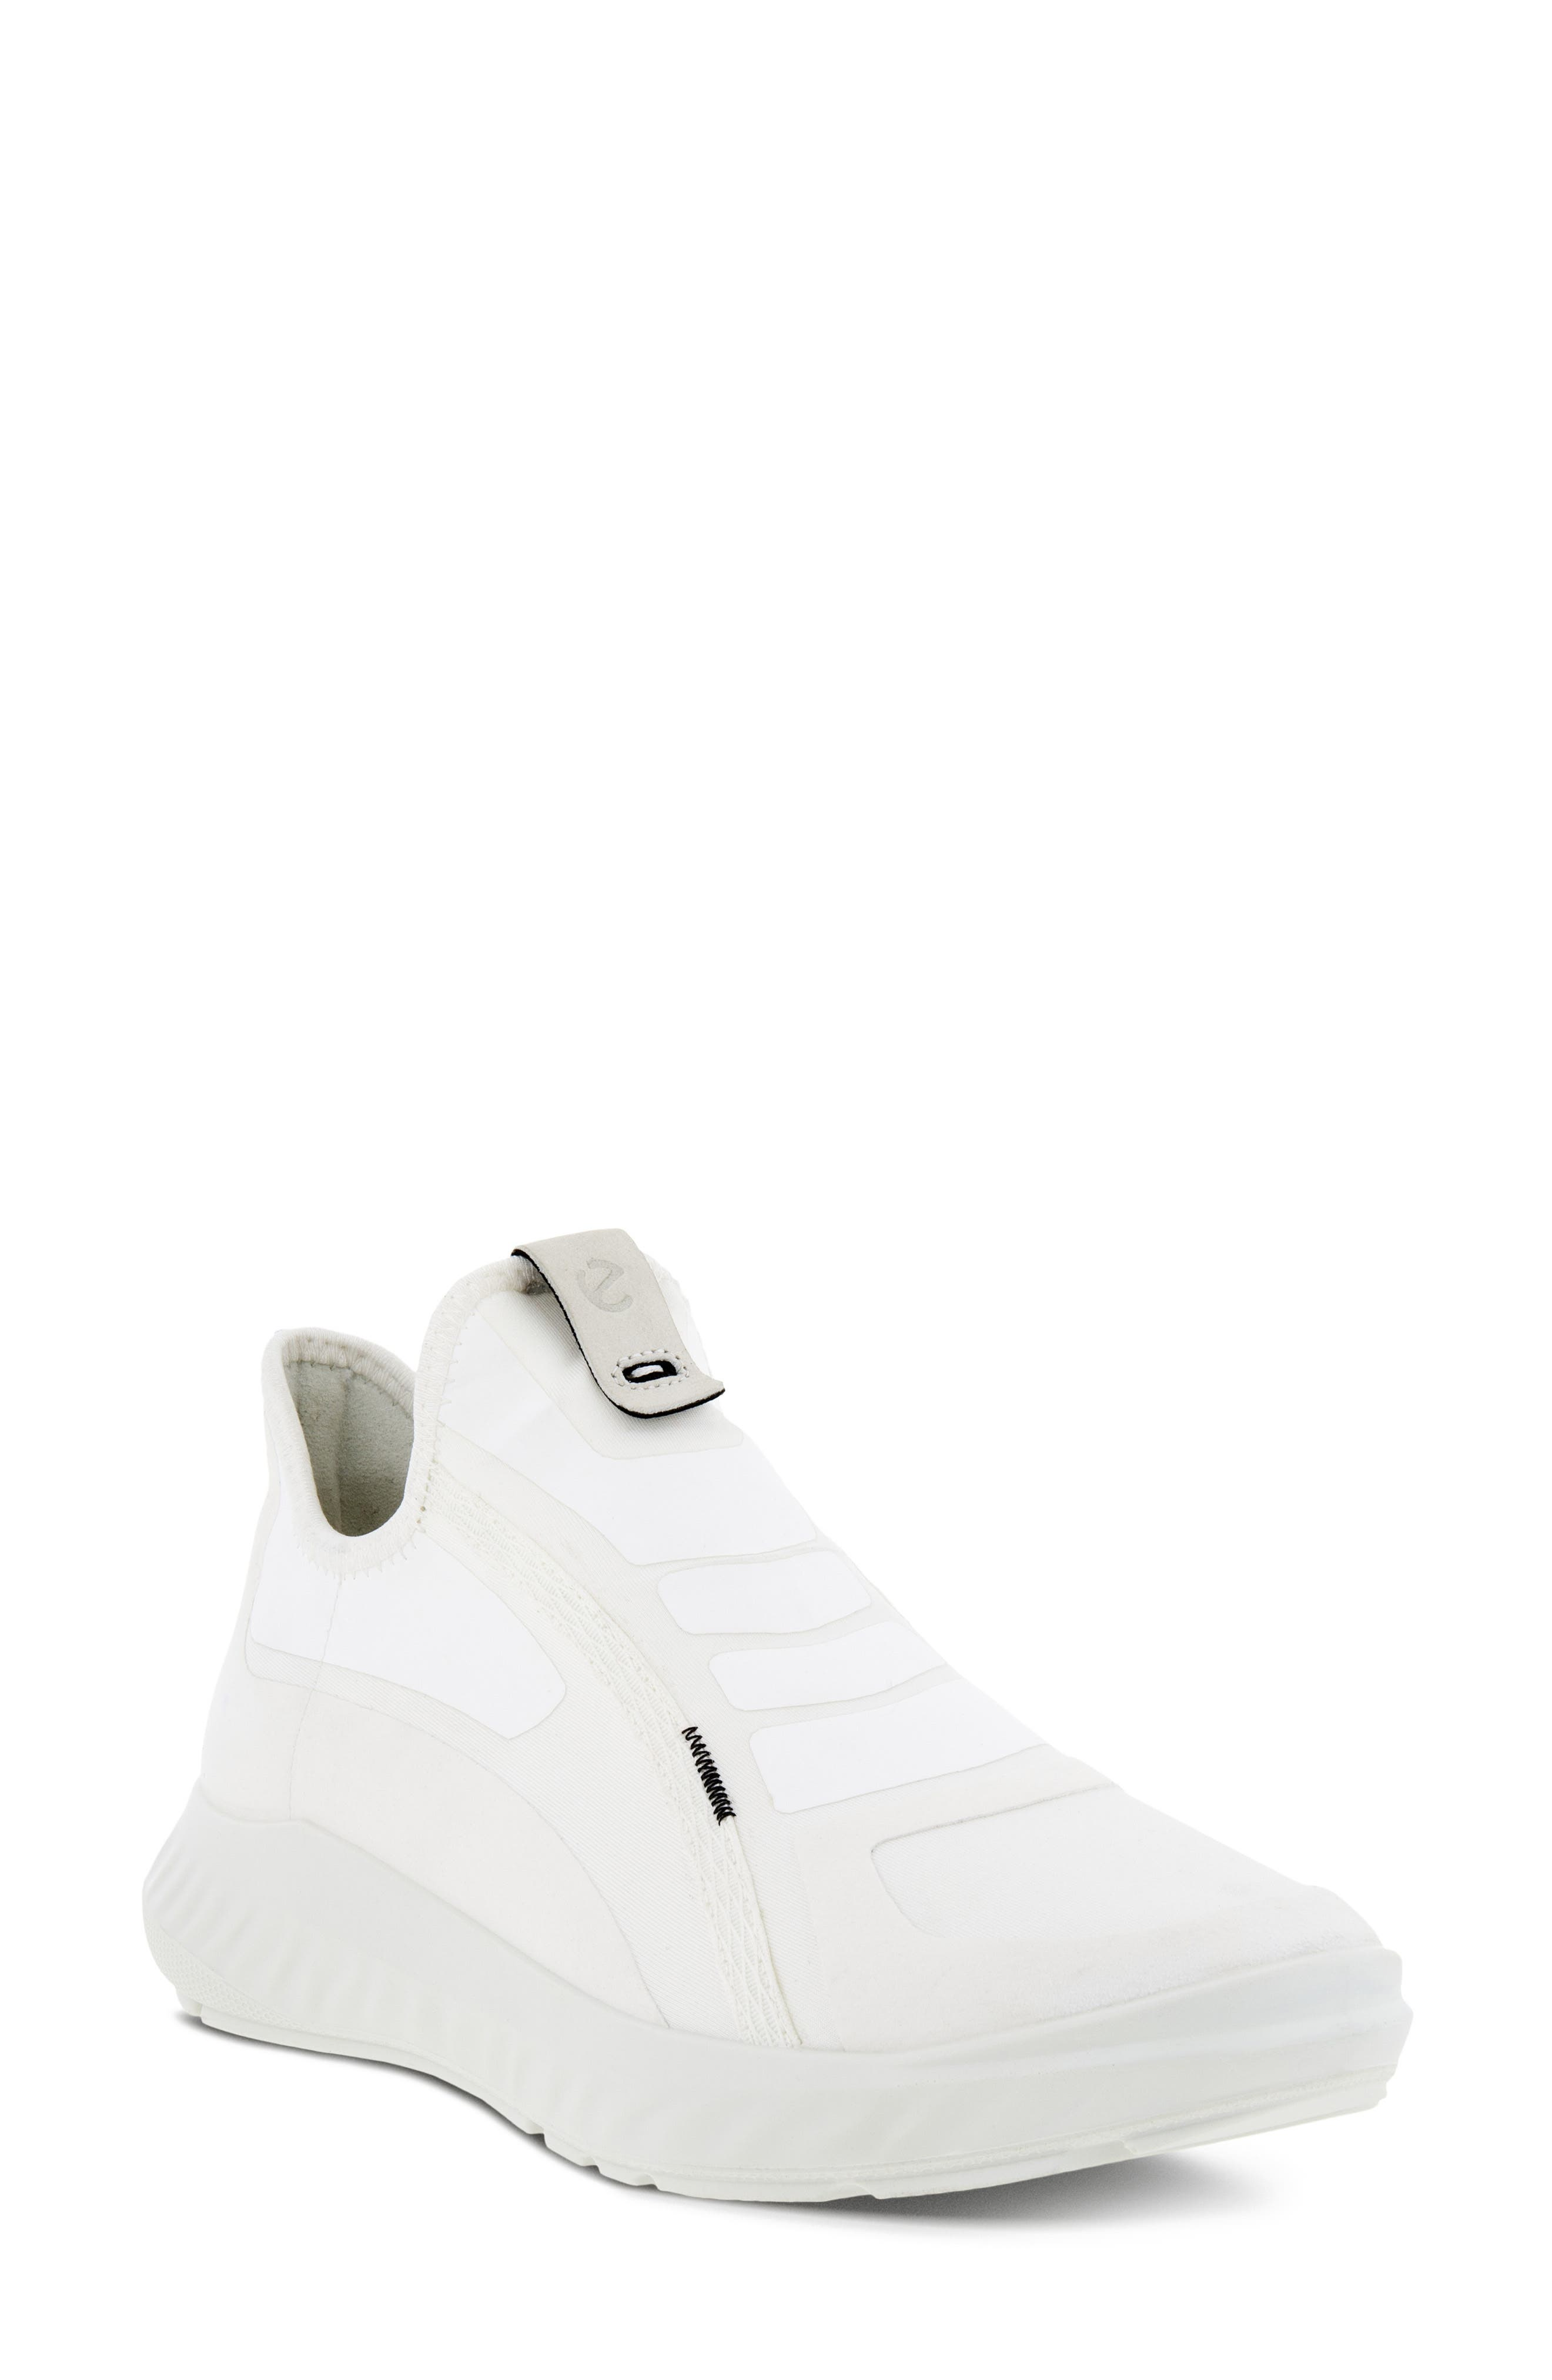 Women's Ecco Ath-1Fw Alpha Slip-On Sneaker